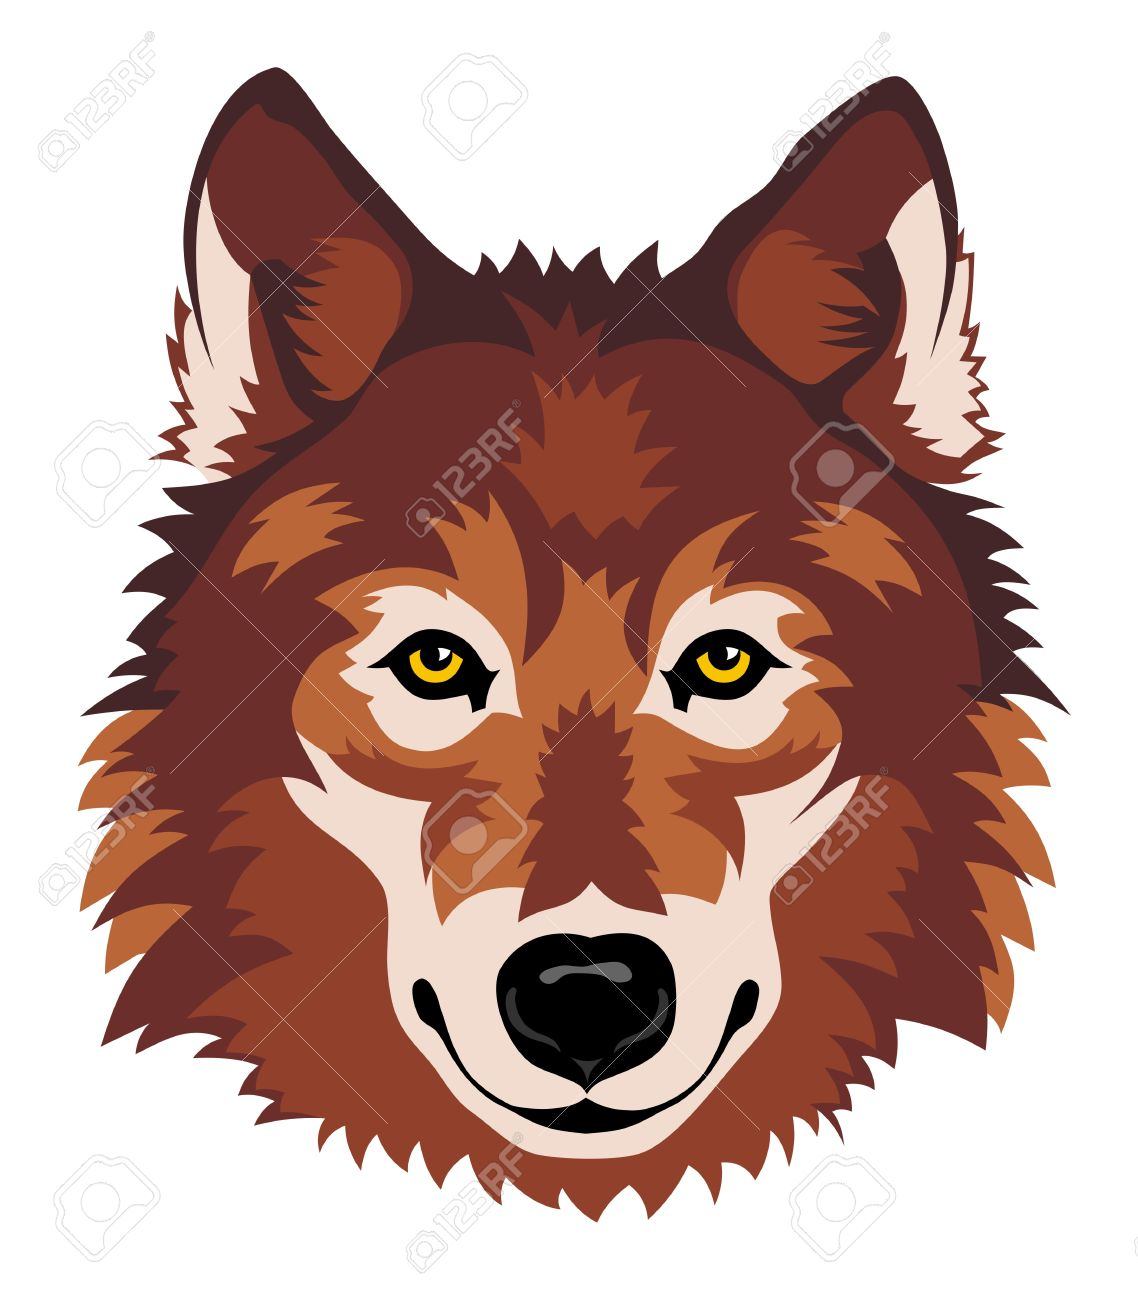 Illustration clipart wolf head Pinterest bear front animals Google